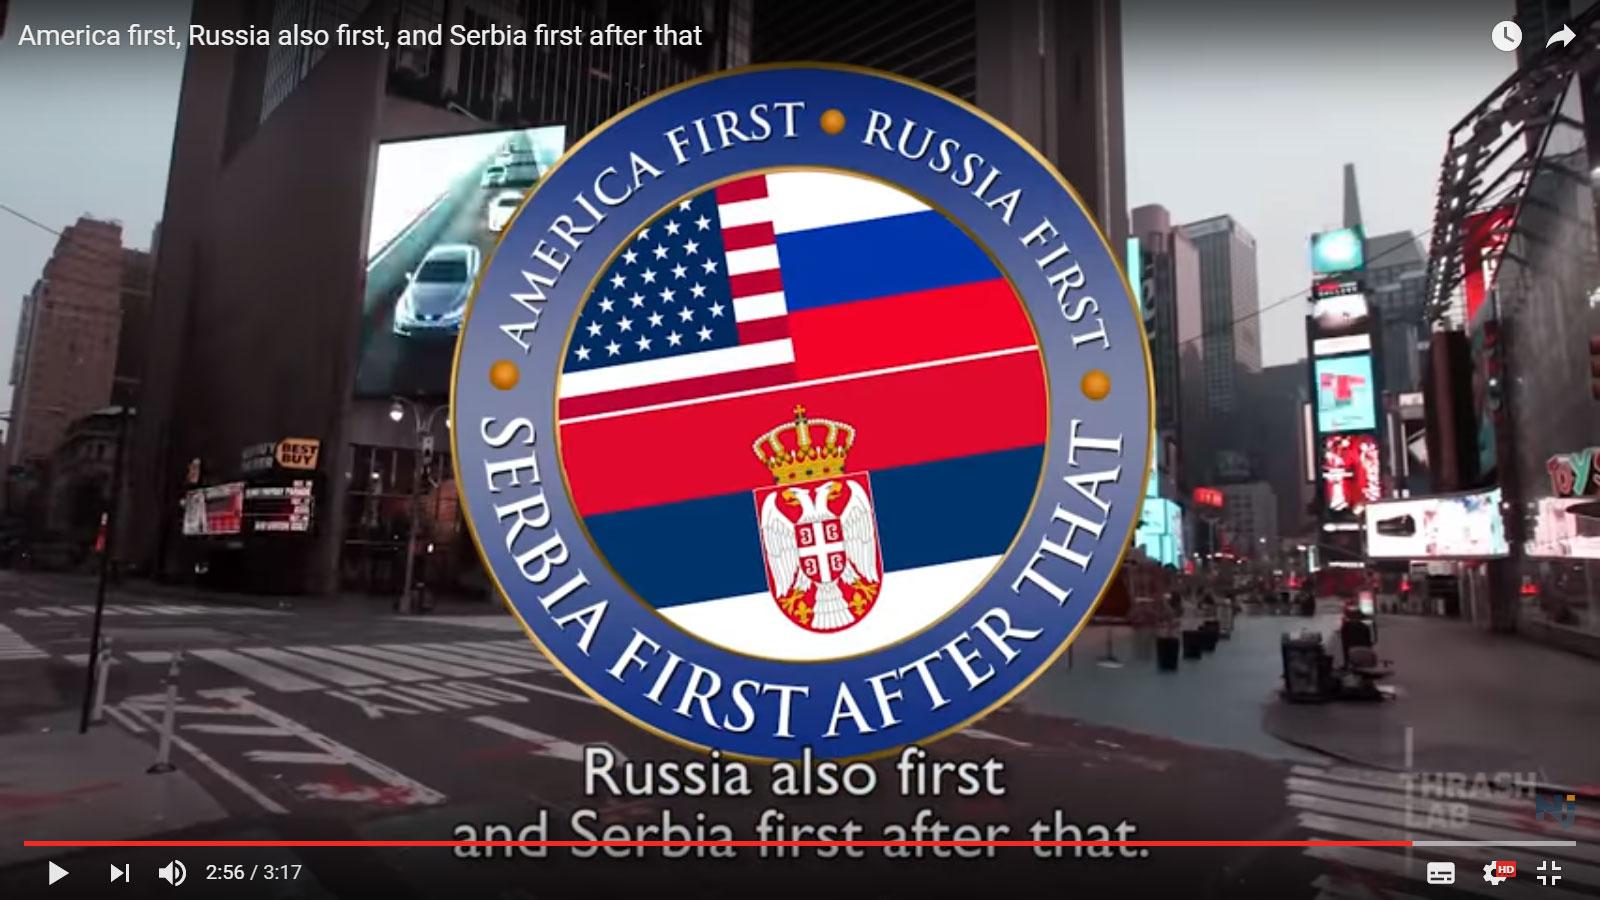 serbia-first-america-first russia first